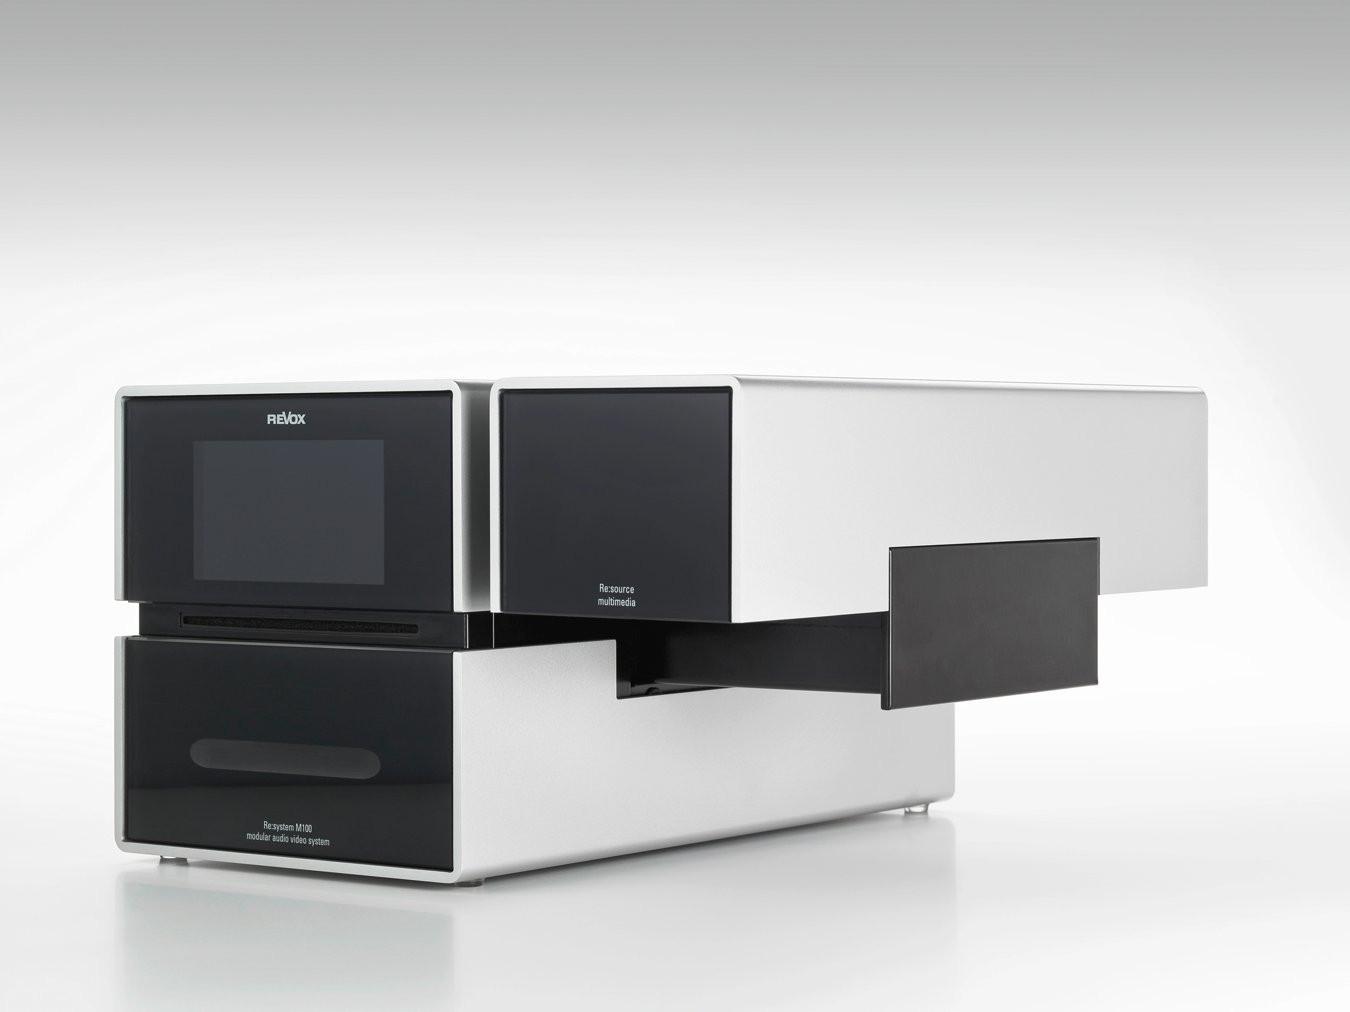 revox m100 multiroom 4 zone modul weiss. Black Bedroom Furniture Sets. Home Design Ideas